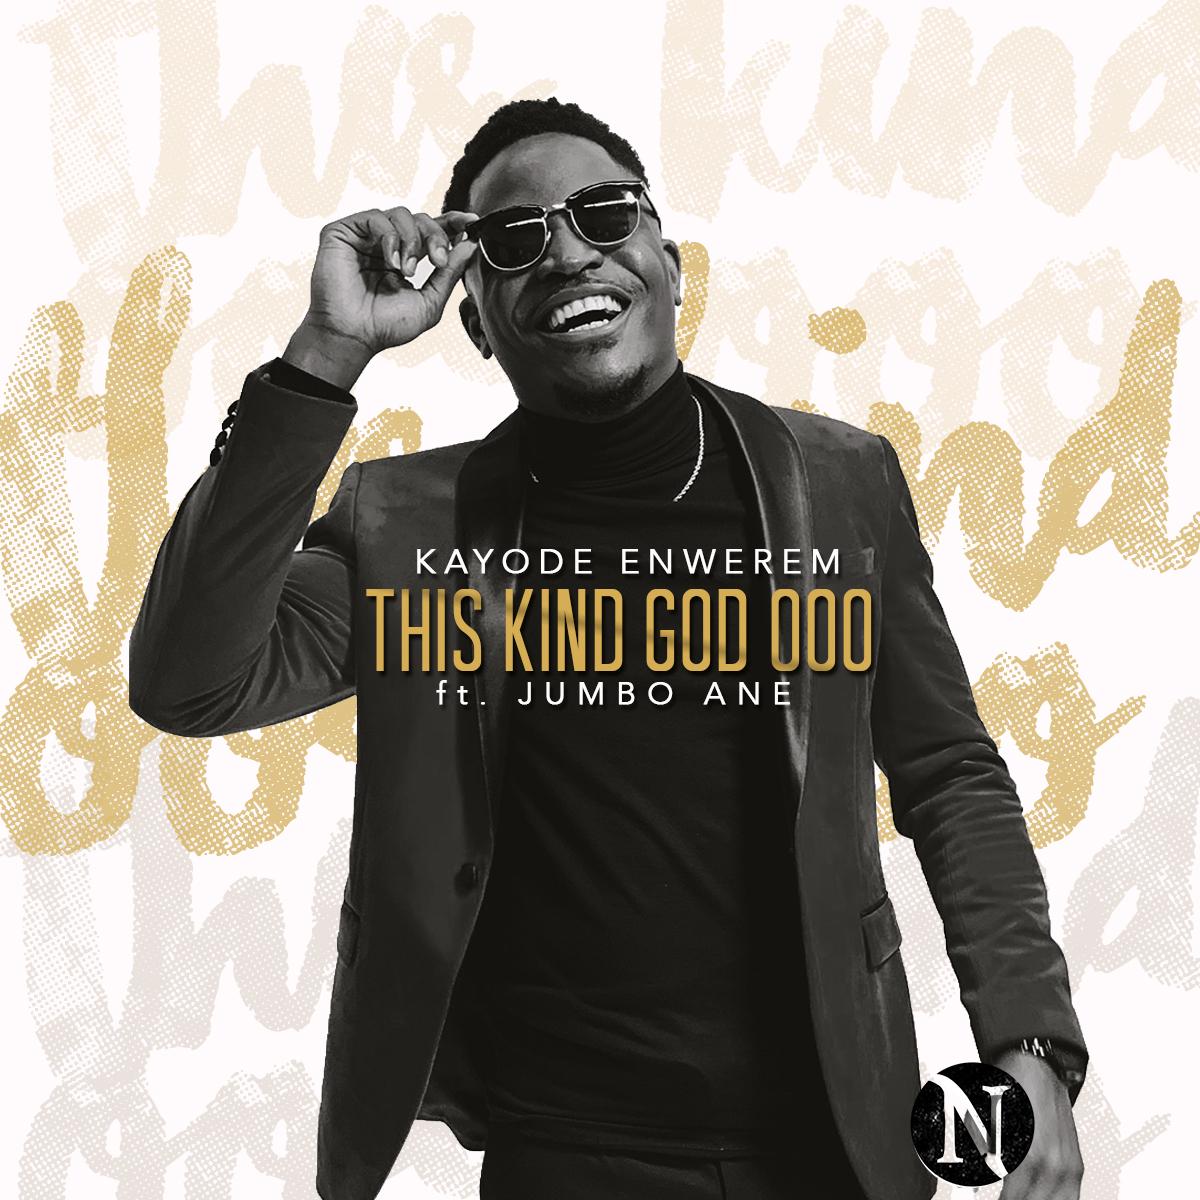 Kayode Enwerem – This Kind God ooo